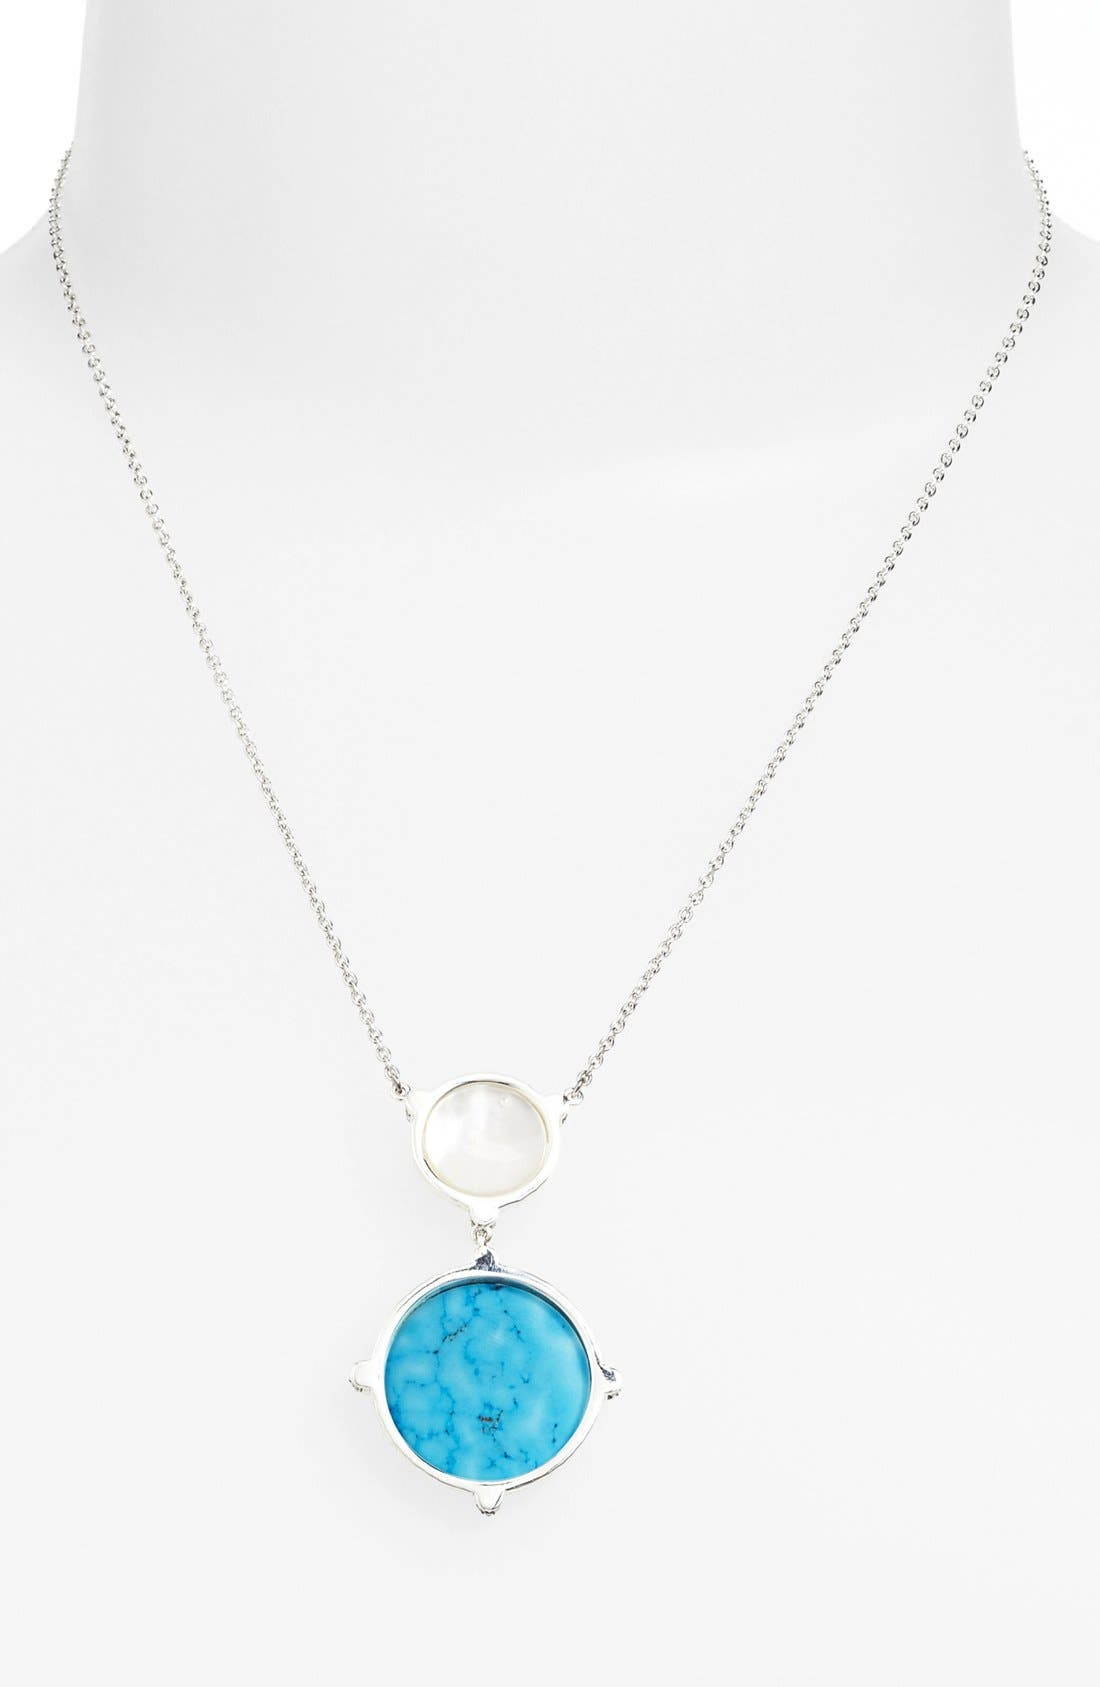 Main Image - Judith Jack 'Coin' Double Drop Pendant Necklace